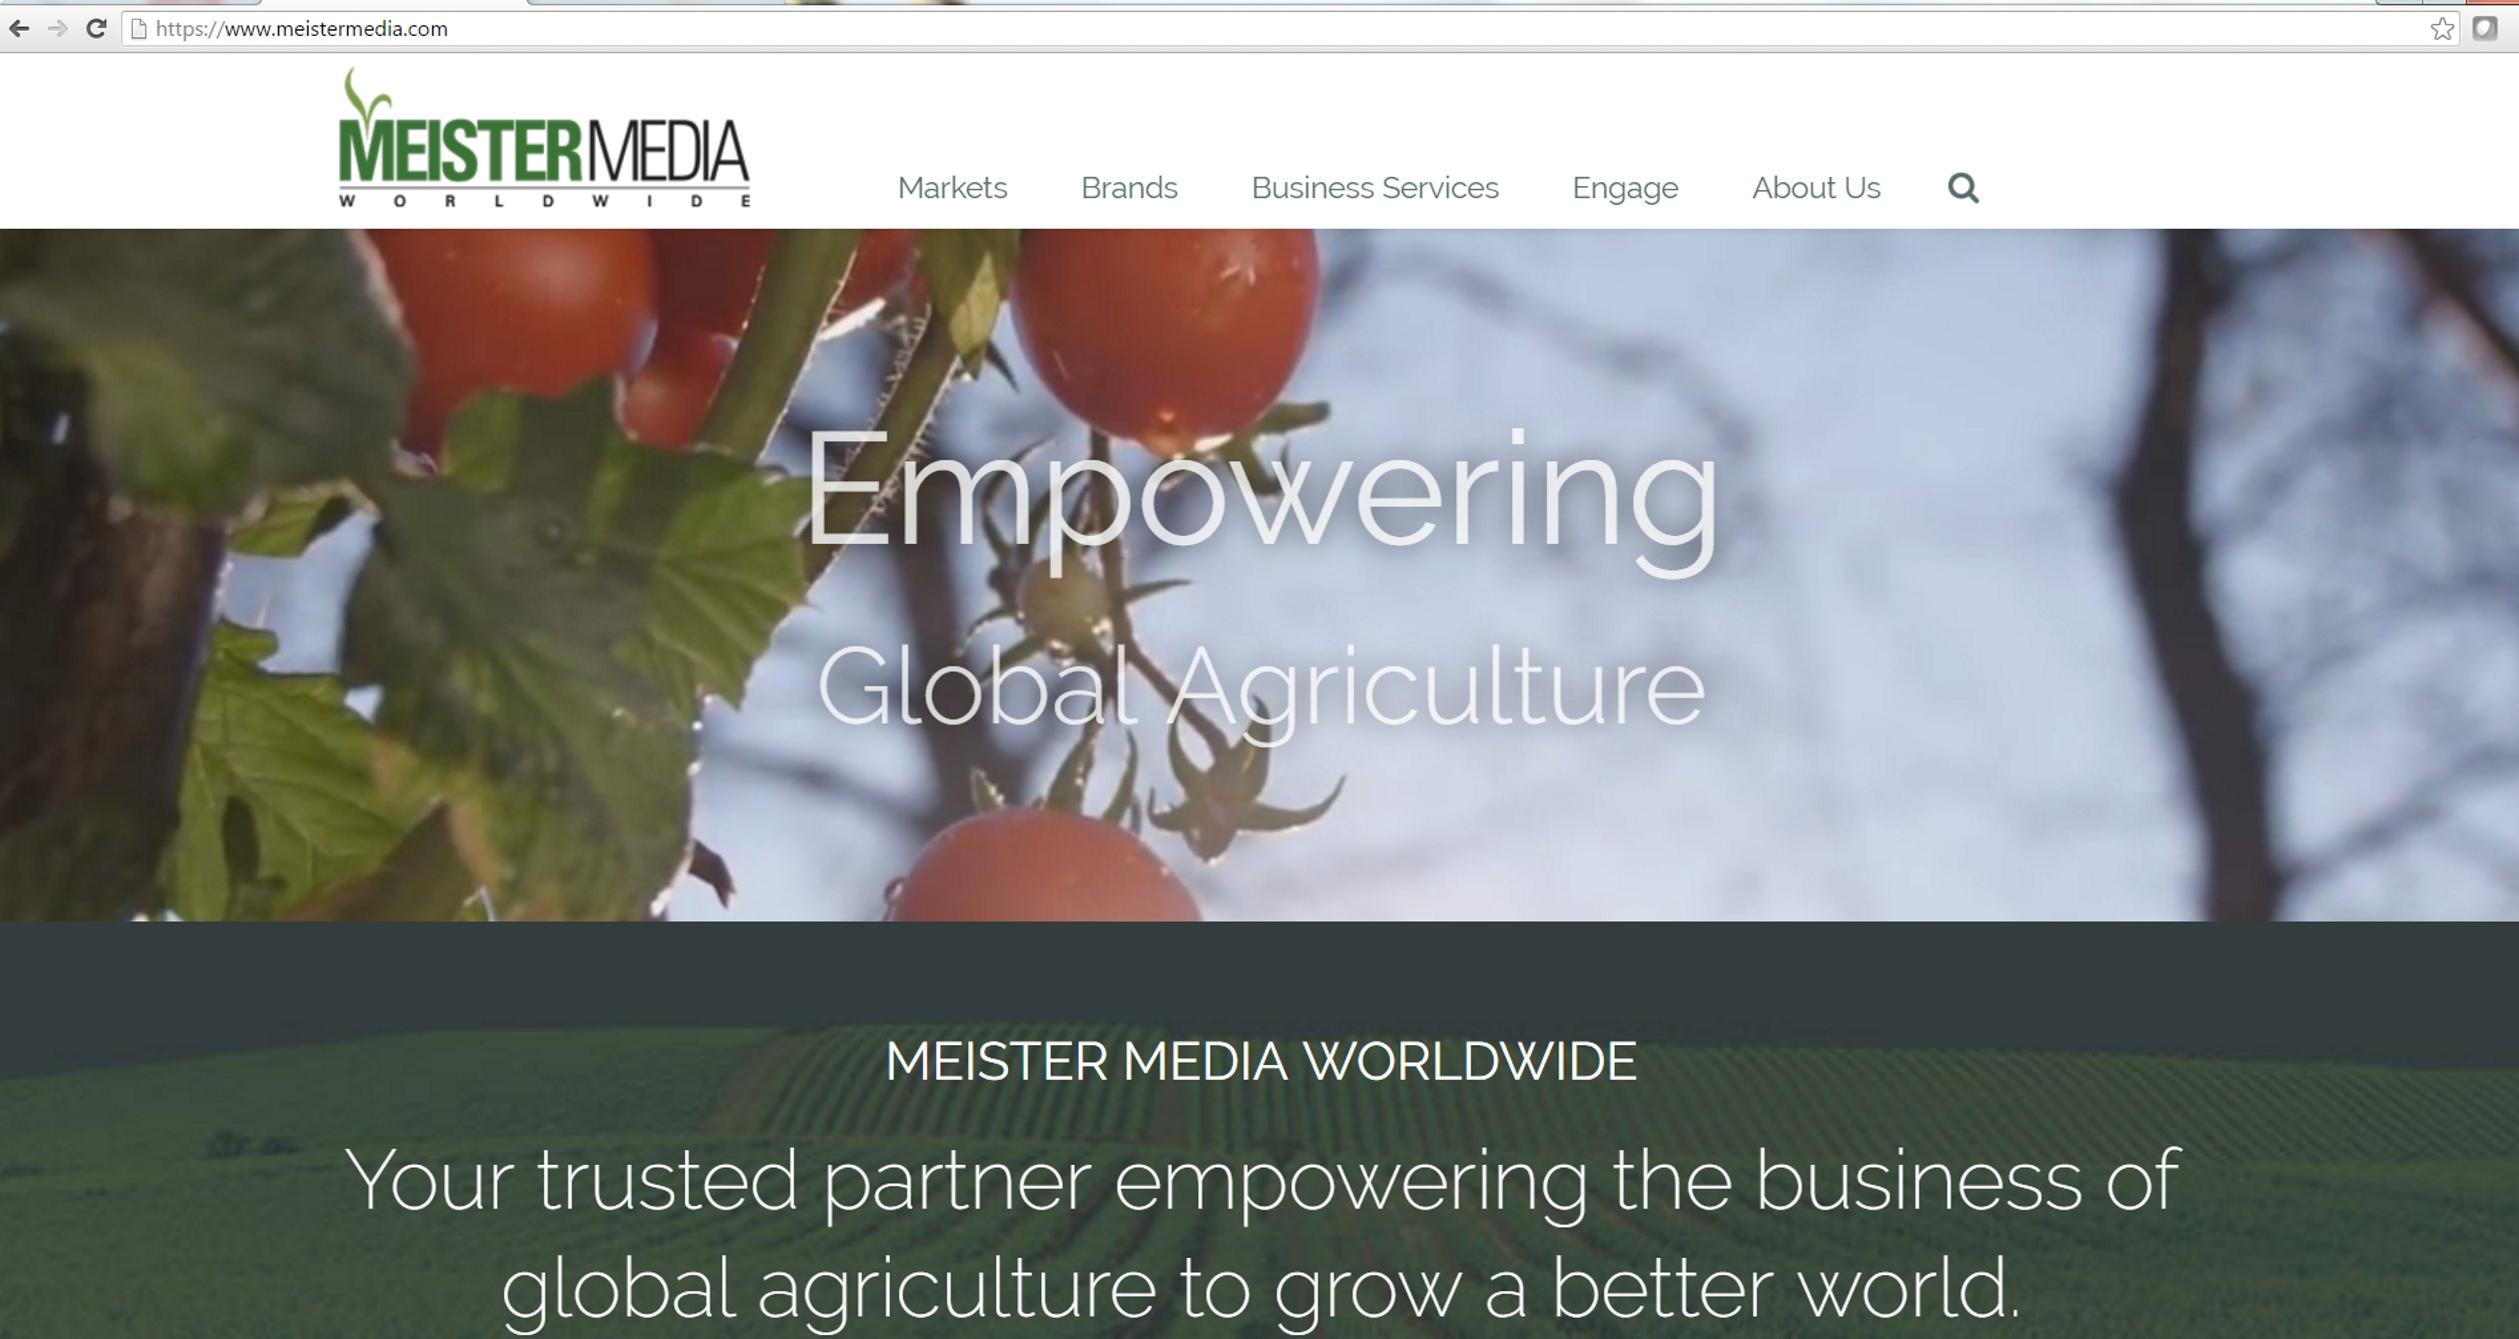 screenshot pdh meistermedia dot com tomatoes